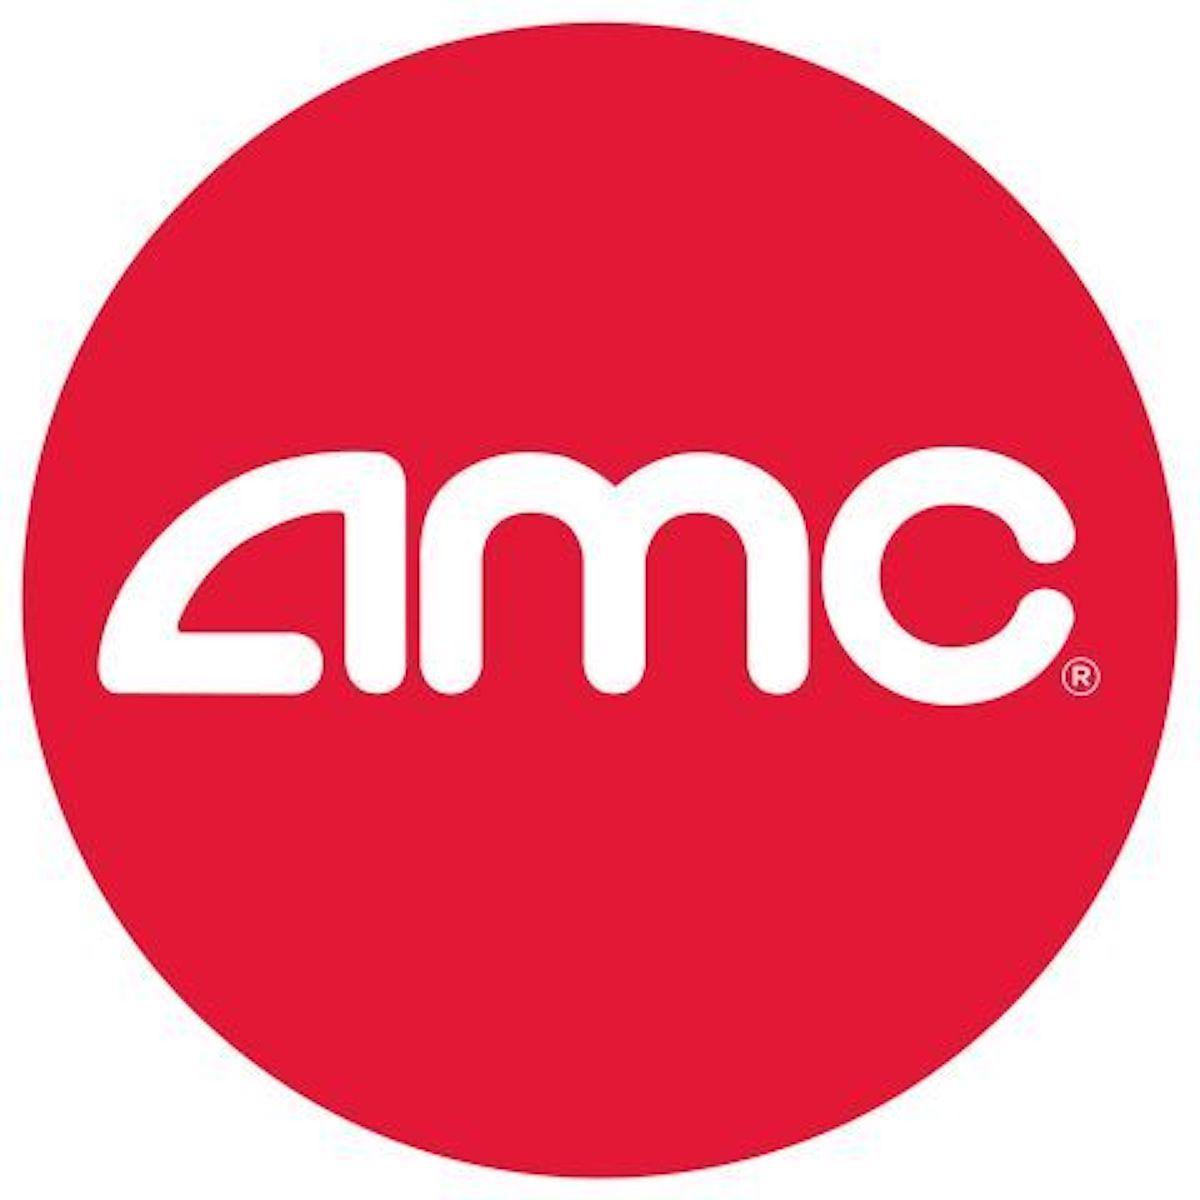 GameStop, AMC Stock Soar Due to Reddits Meme Stock